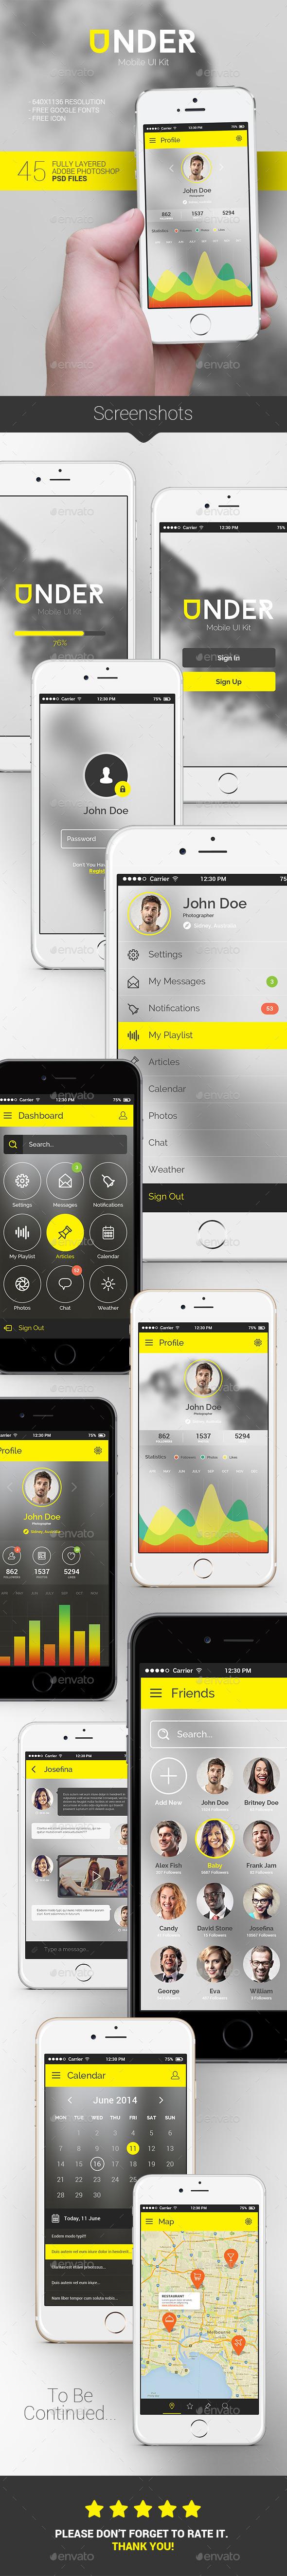 GraphicRiver Under Mobile UI Kit 9535027